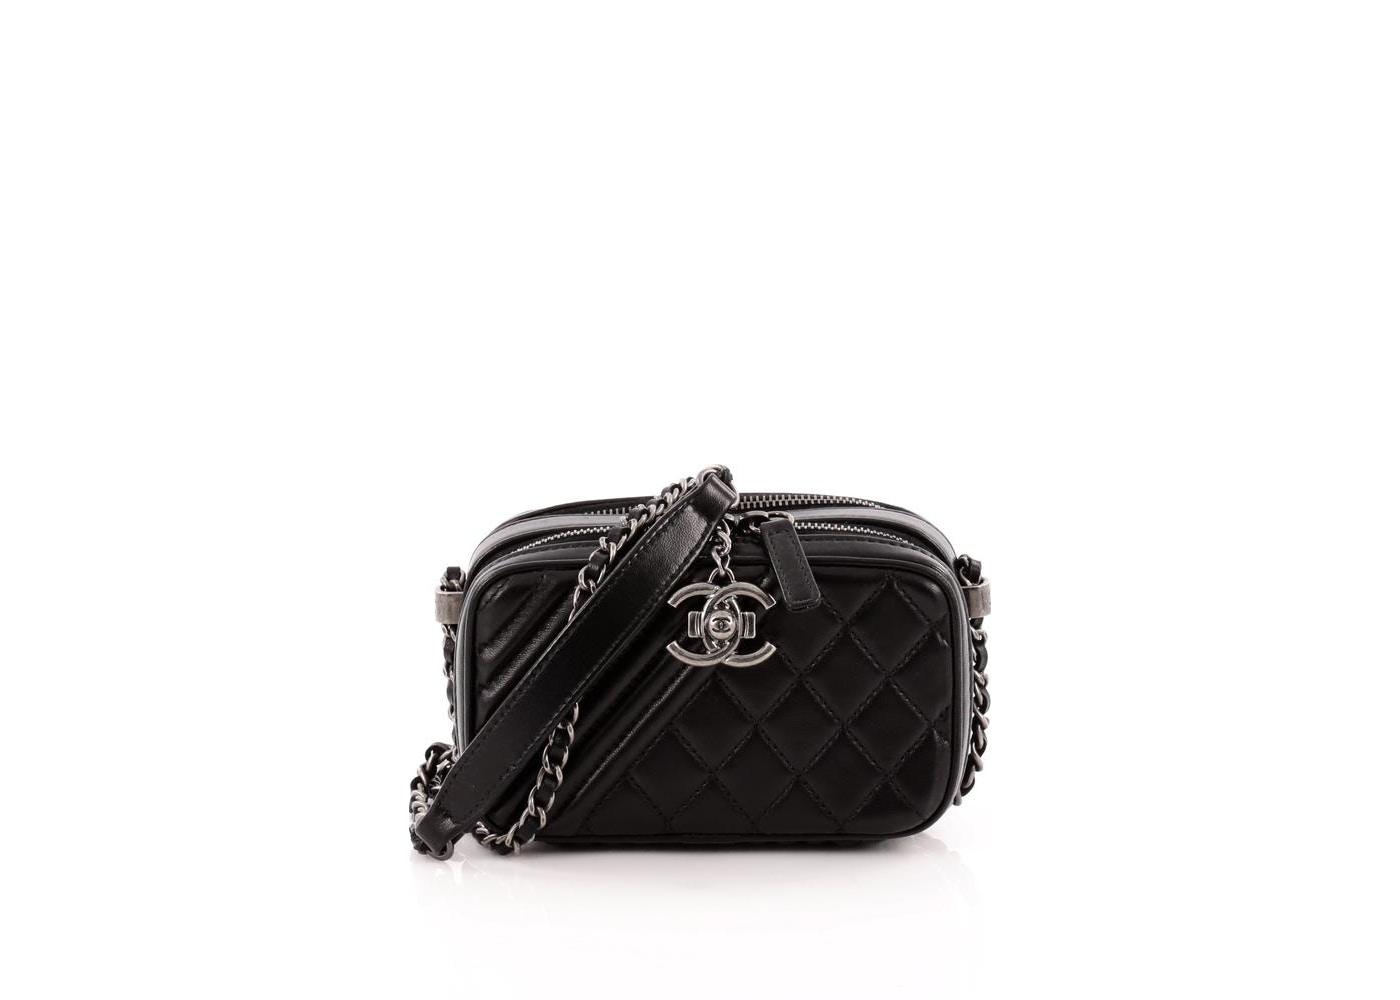 dda093743283 Chanel Coco Boy Camera Bag Quilted Diagonal Diamond Mini Black. Quilted  Diagonal Diamond Mini Black